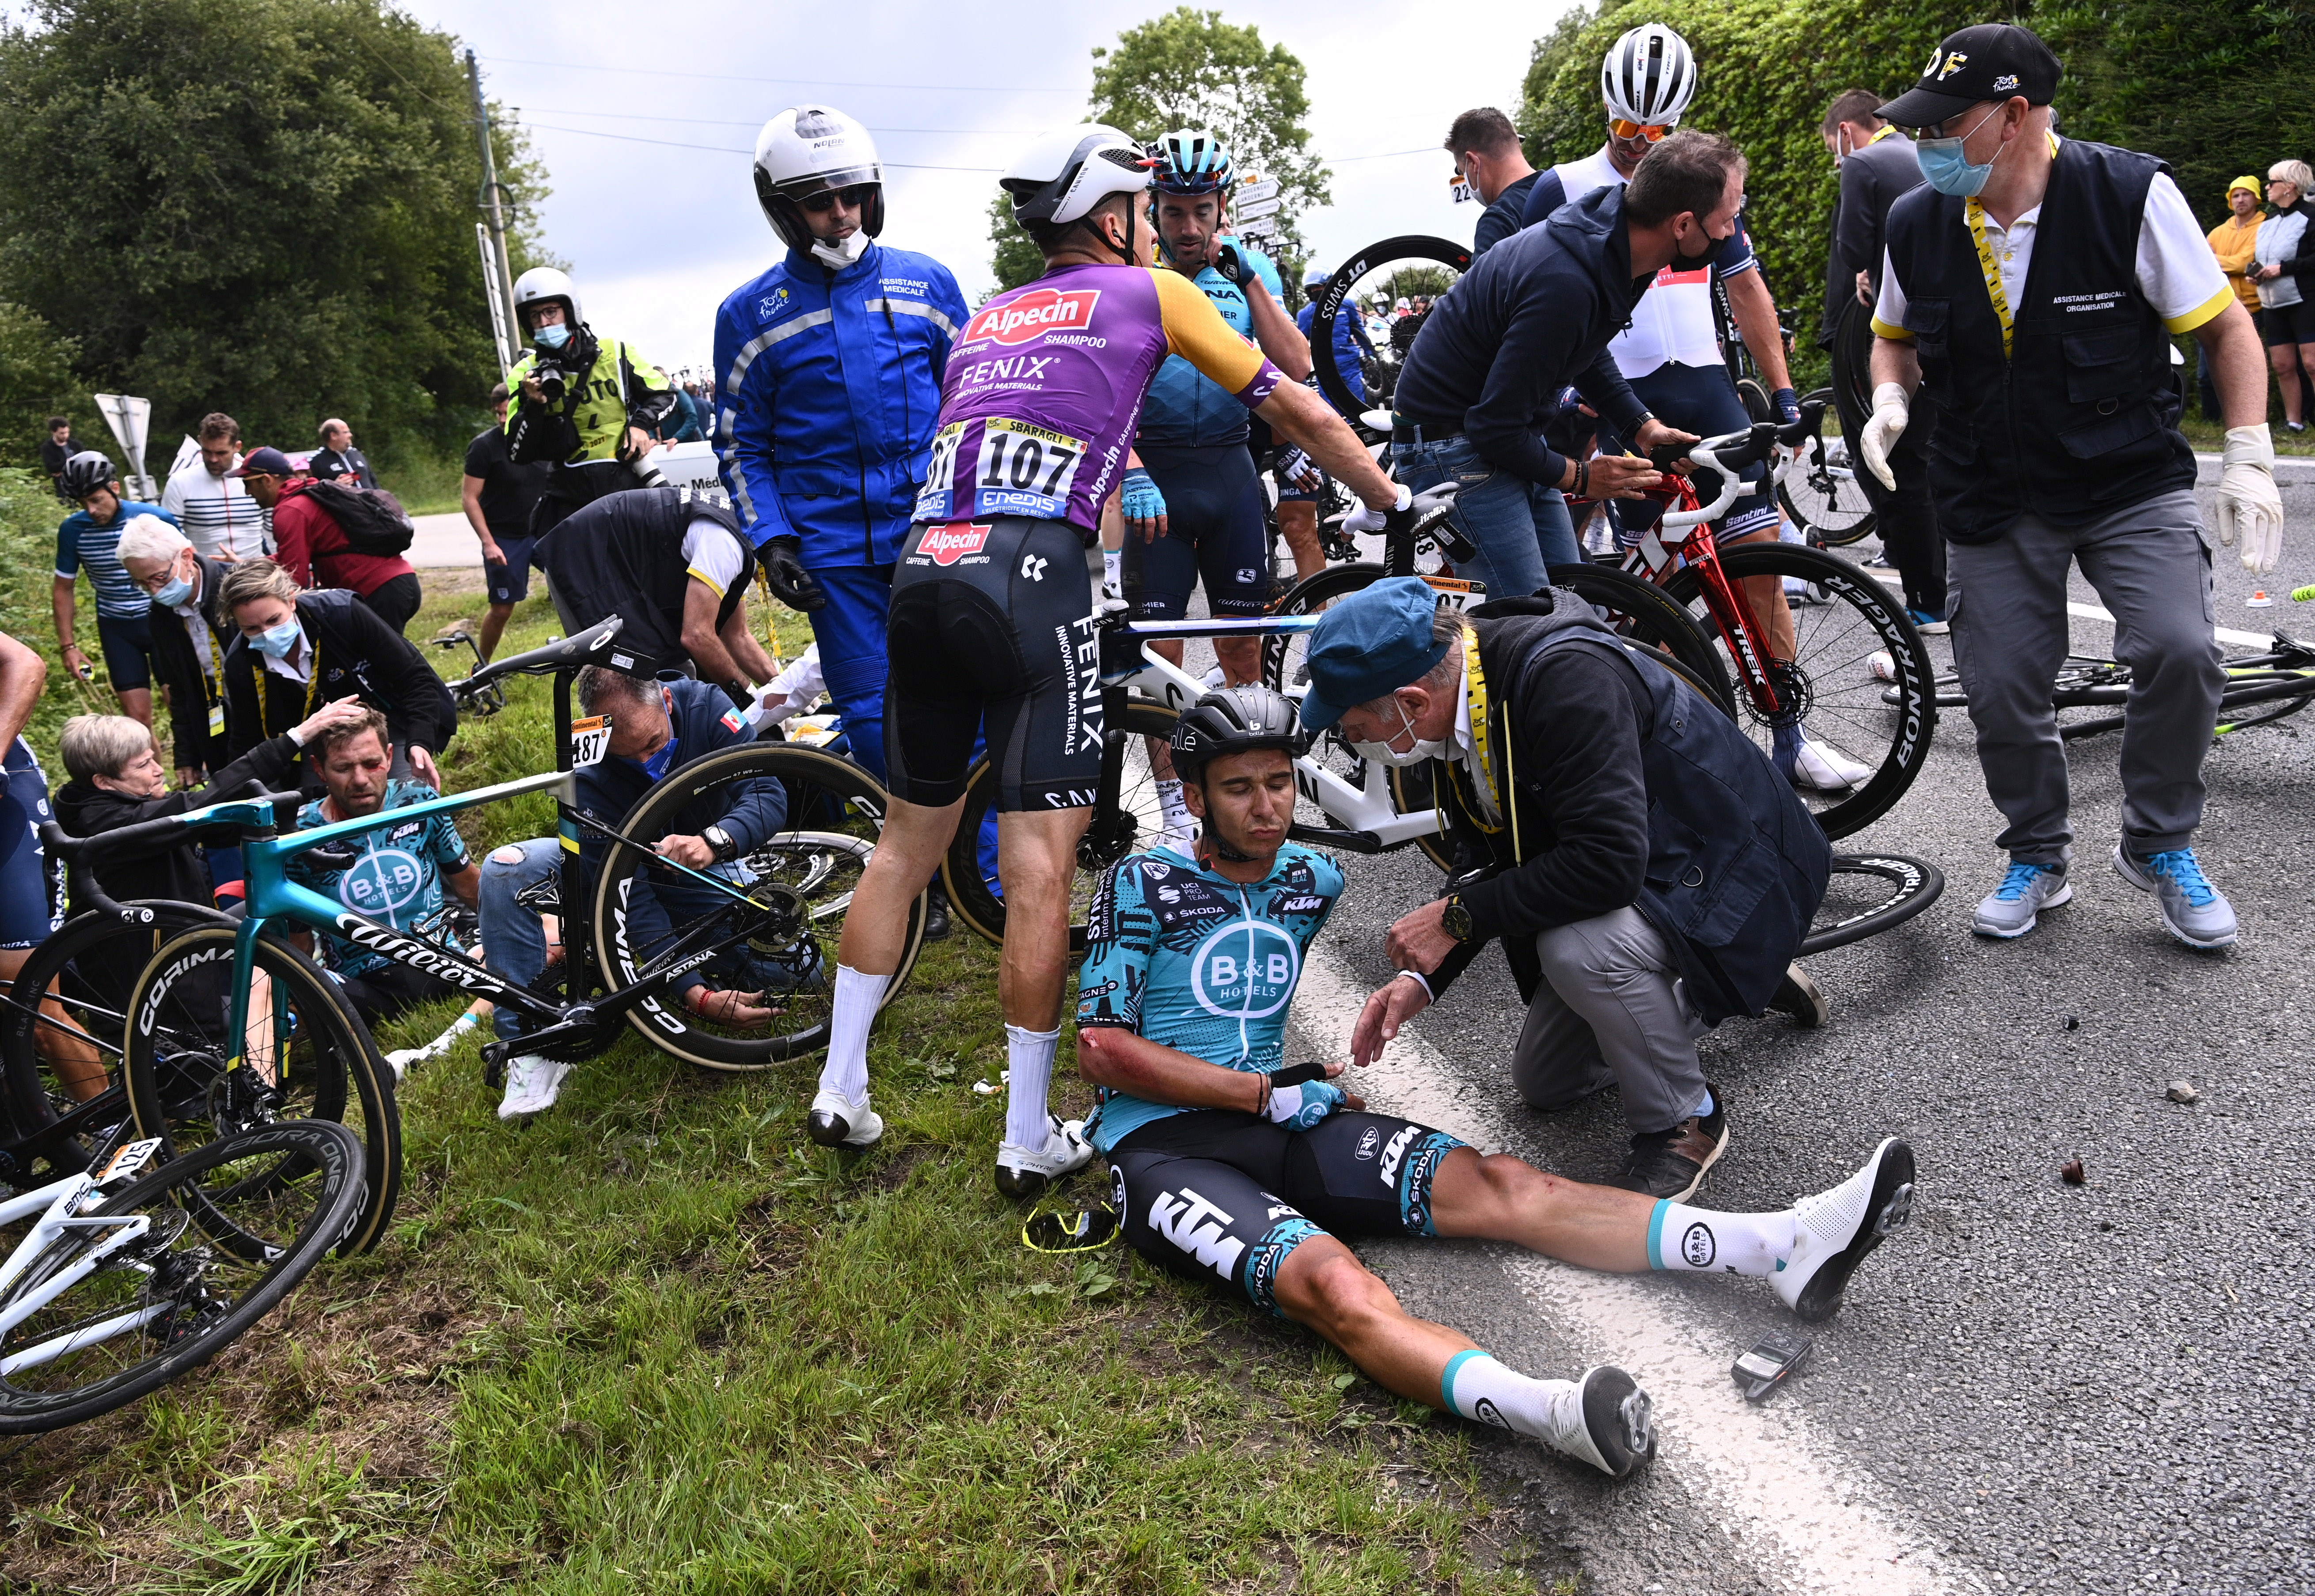 Cycling - Tour de France - Stage 1 - Brest to Landerneau - France - June 26, 2021 B&B Hotels p/b KTM rider Cyril Lemoine of France receives medical attention Pool via REUTERS/Anne-Christine Poujoulat